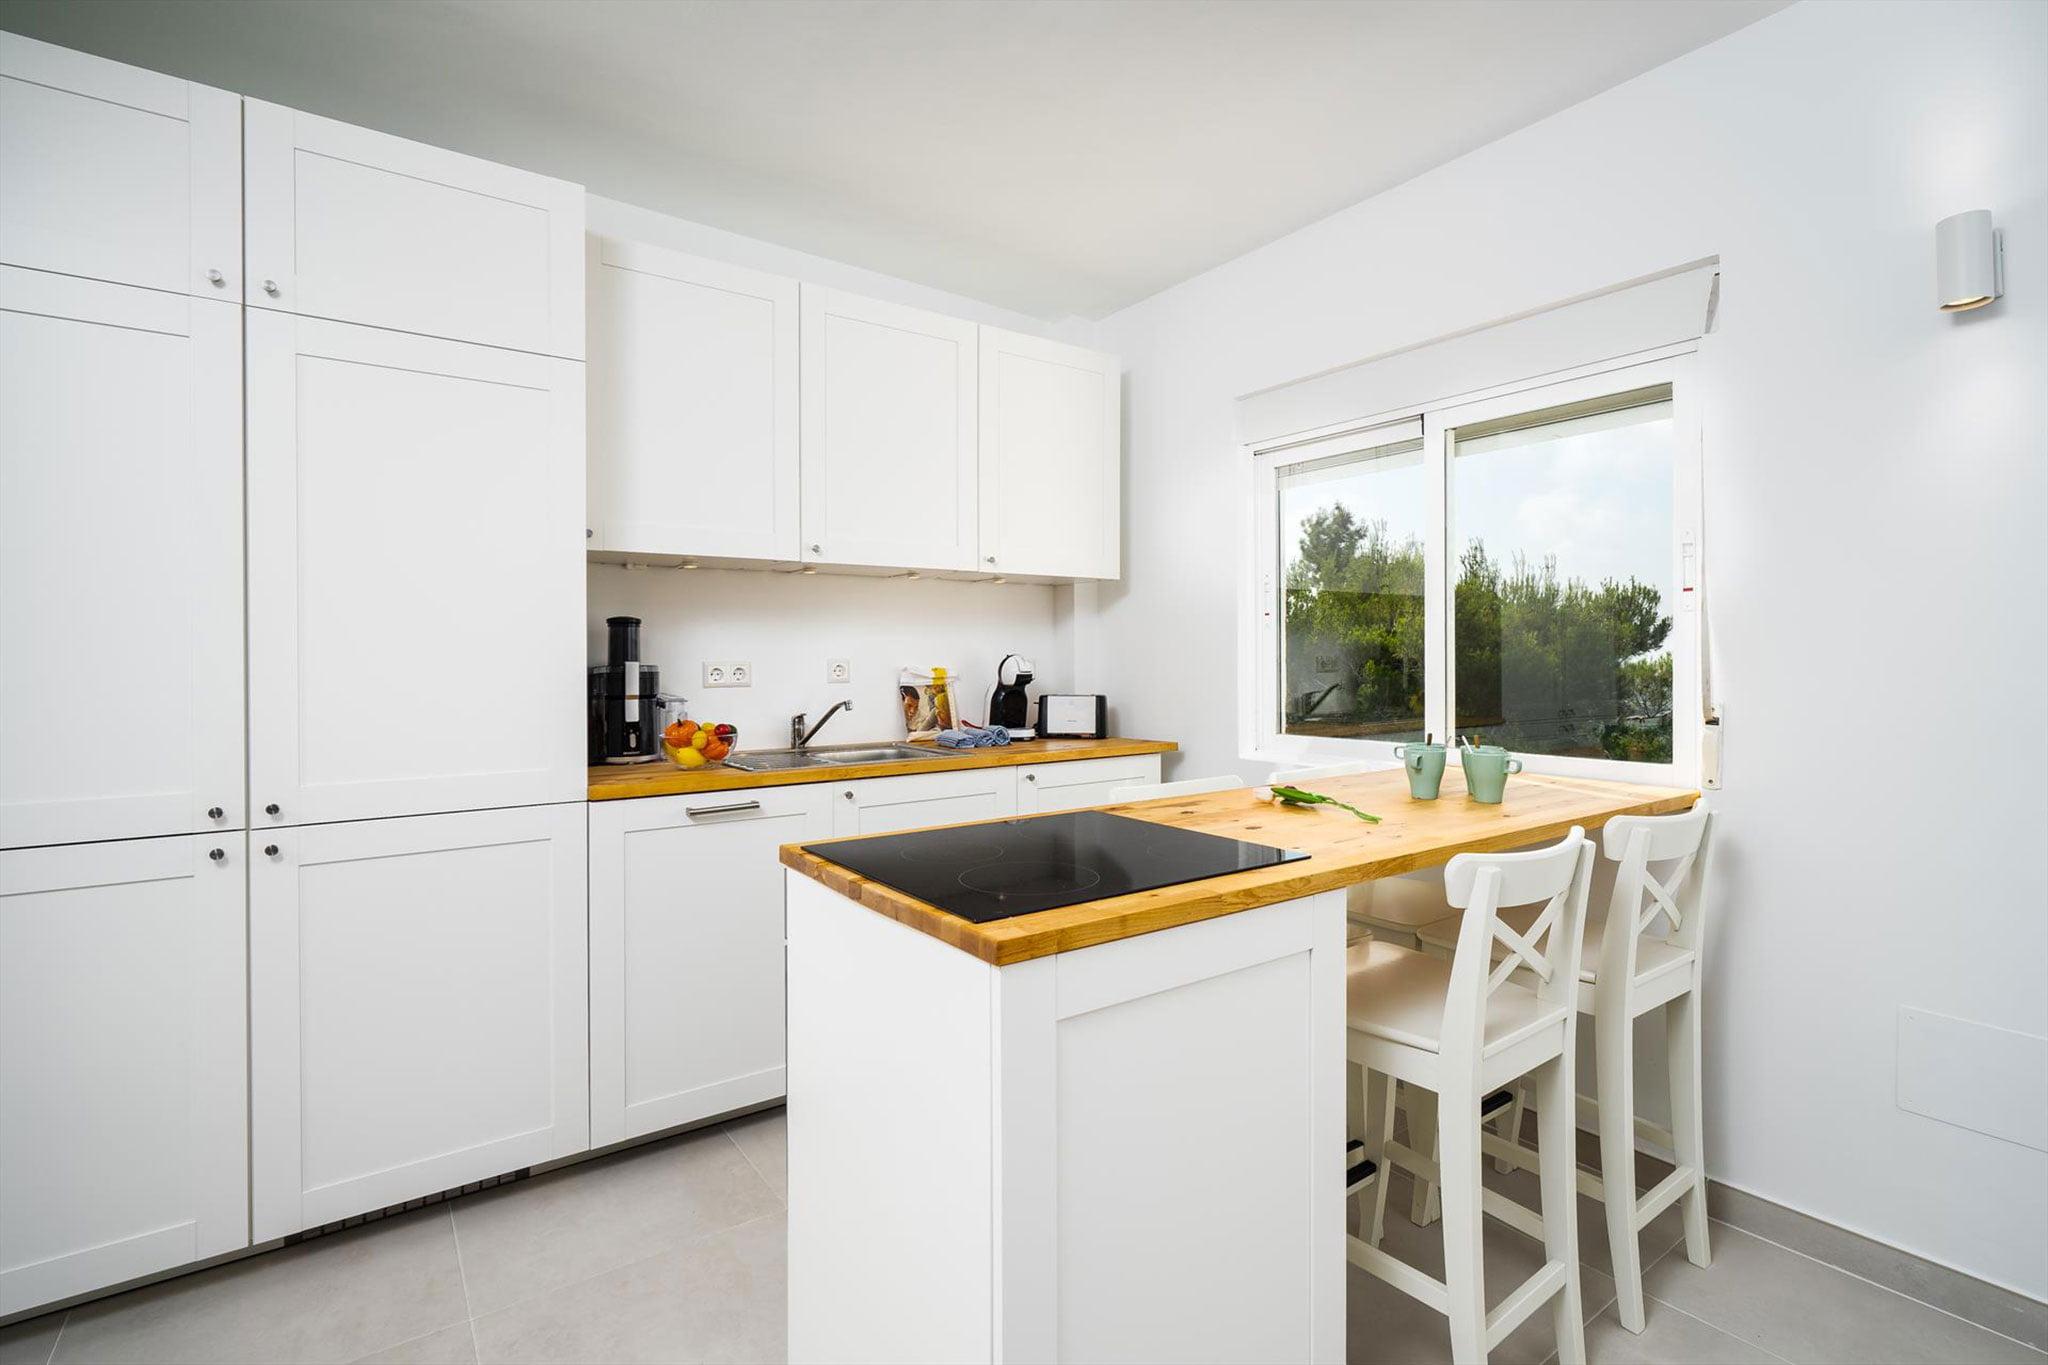 Американская кухня в апартаментах в аренду на время отпуска в Дения - Aguila Rent a Villa